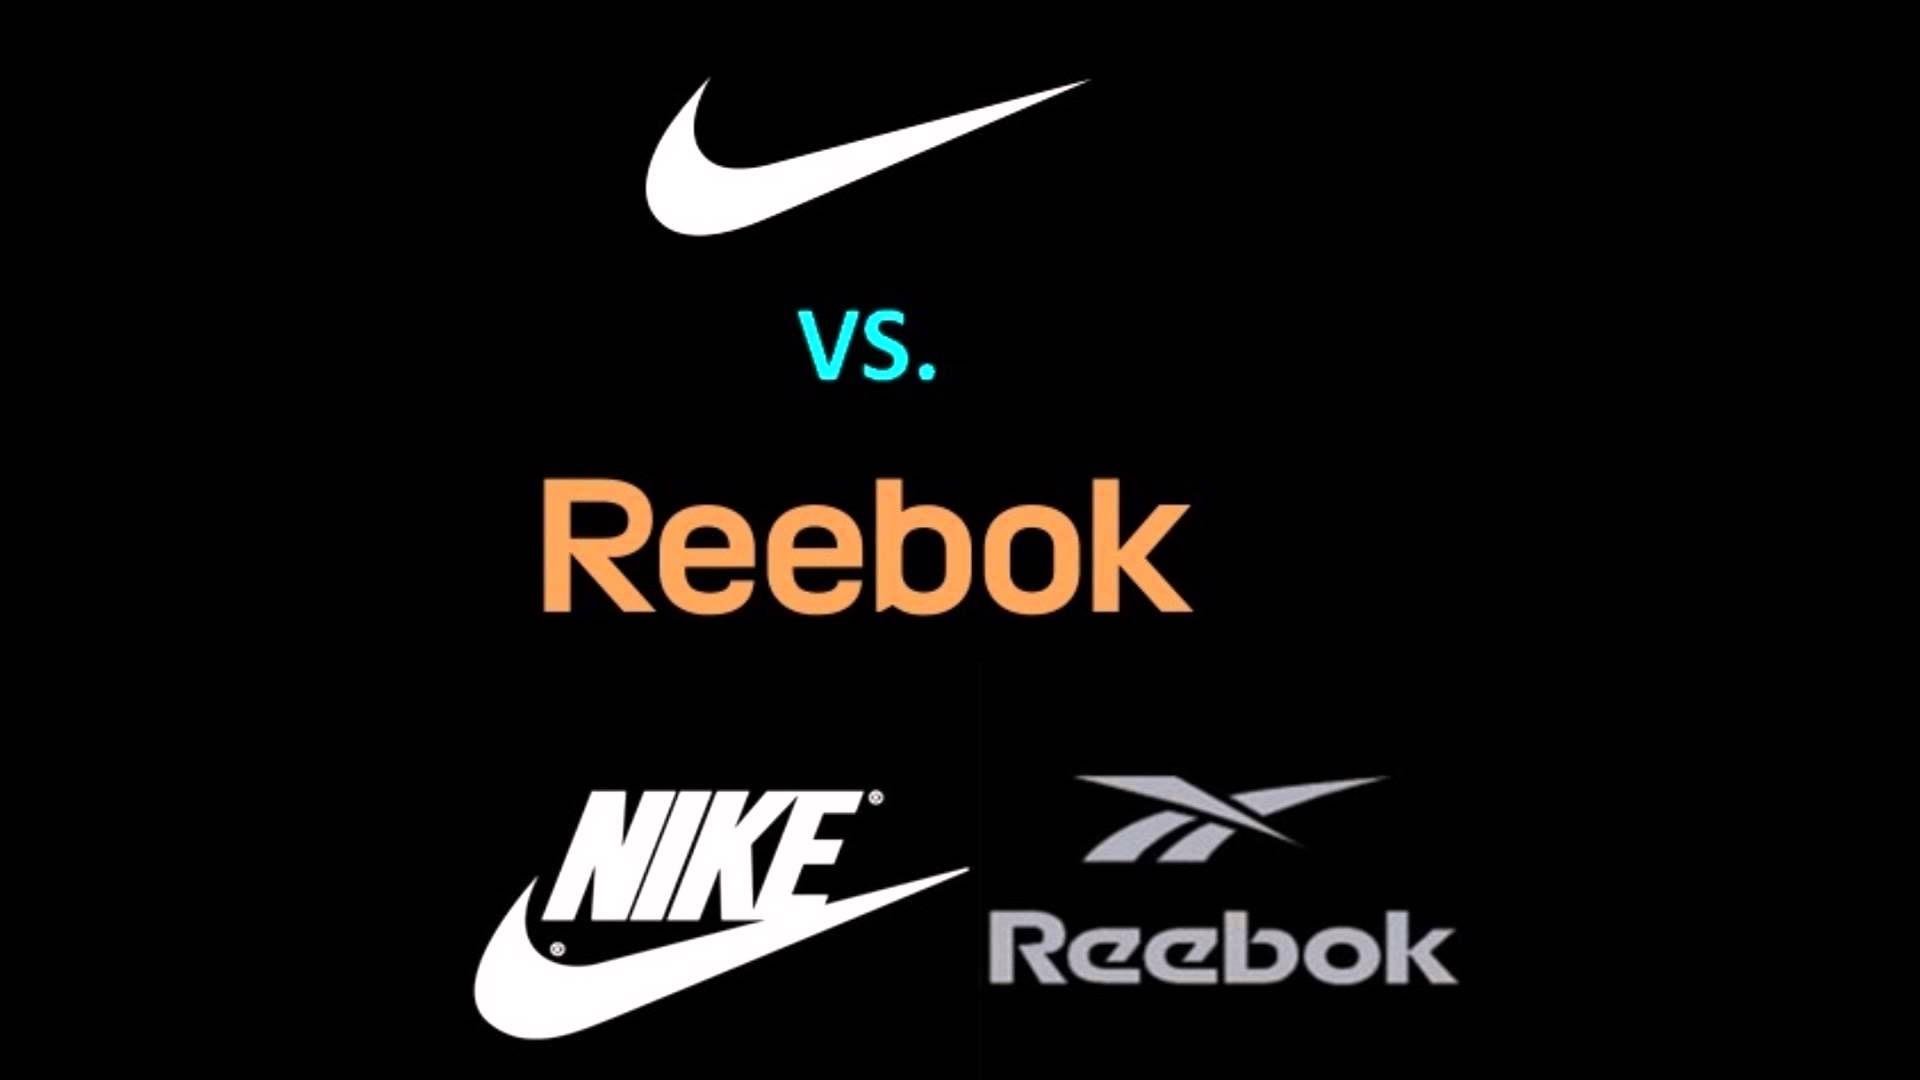 ¿Esas son Reebok o son Nike? ORIGINAL